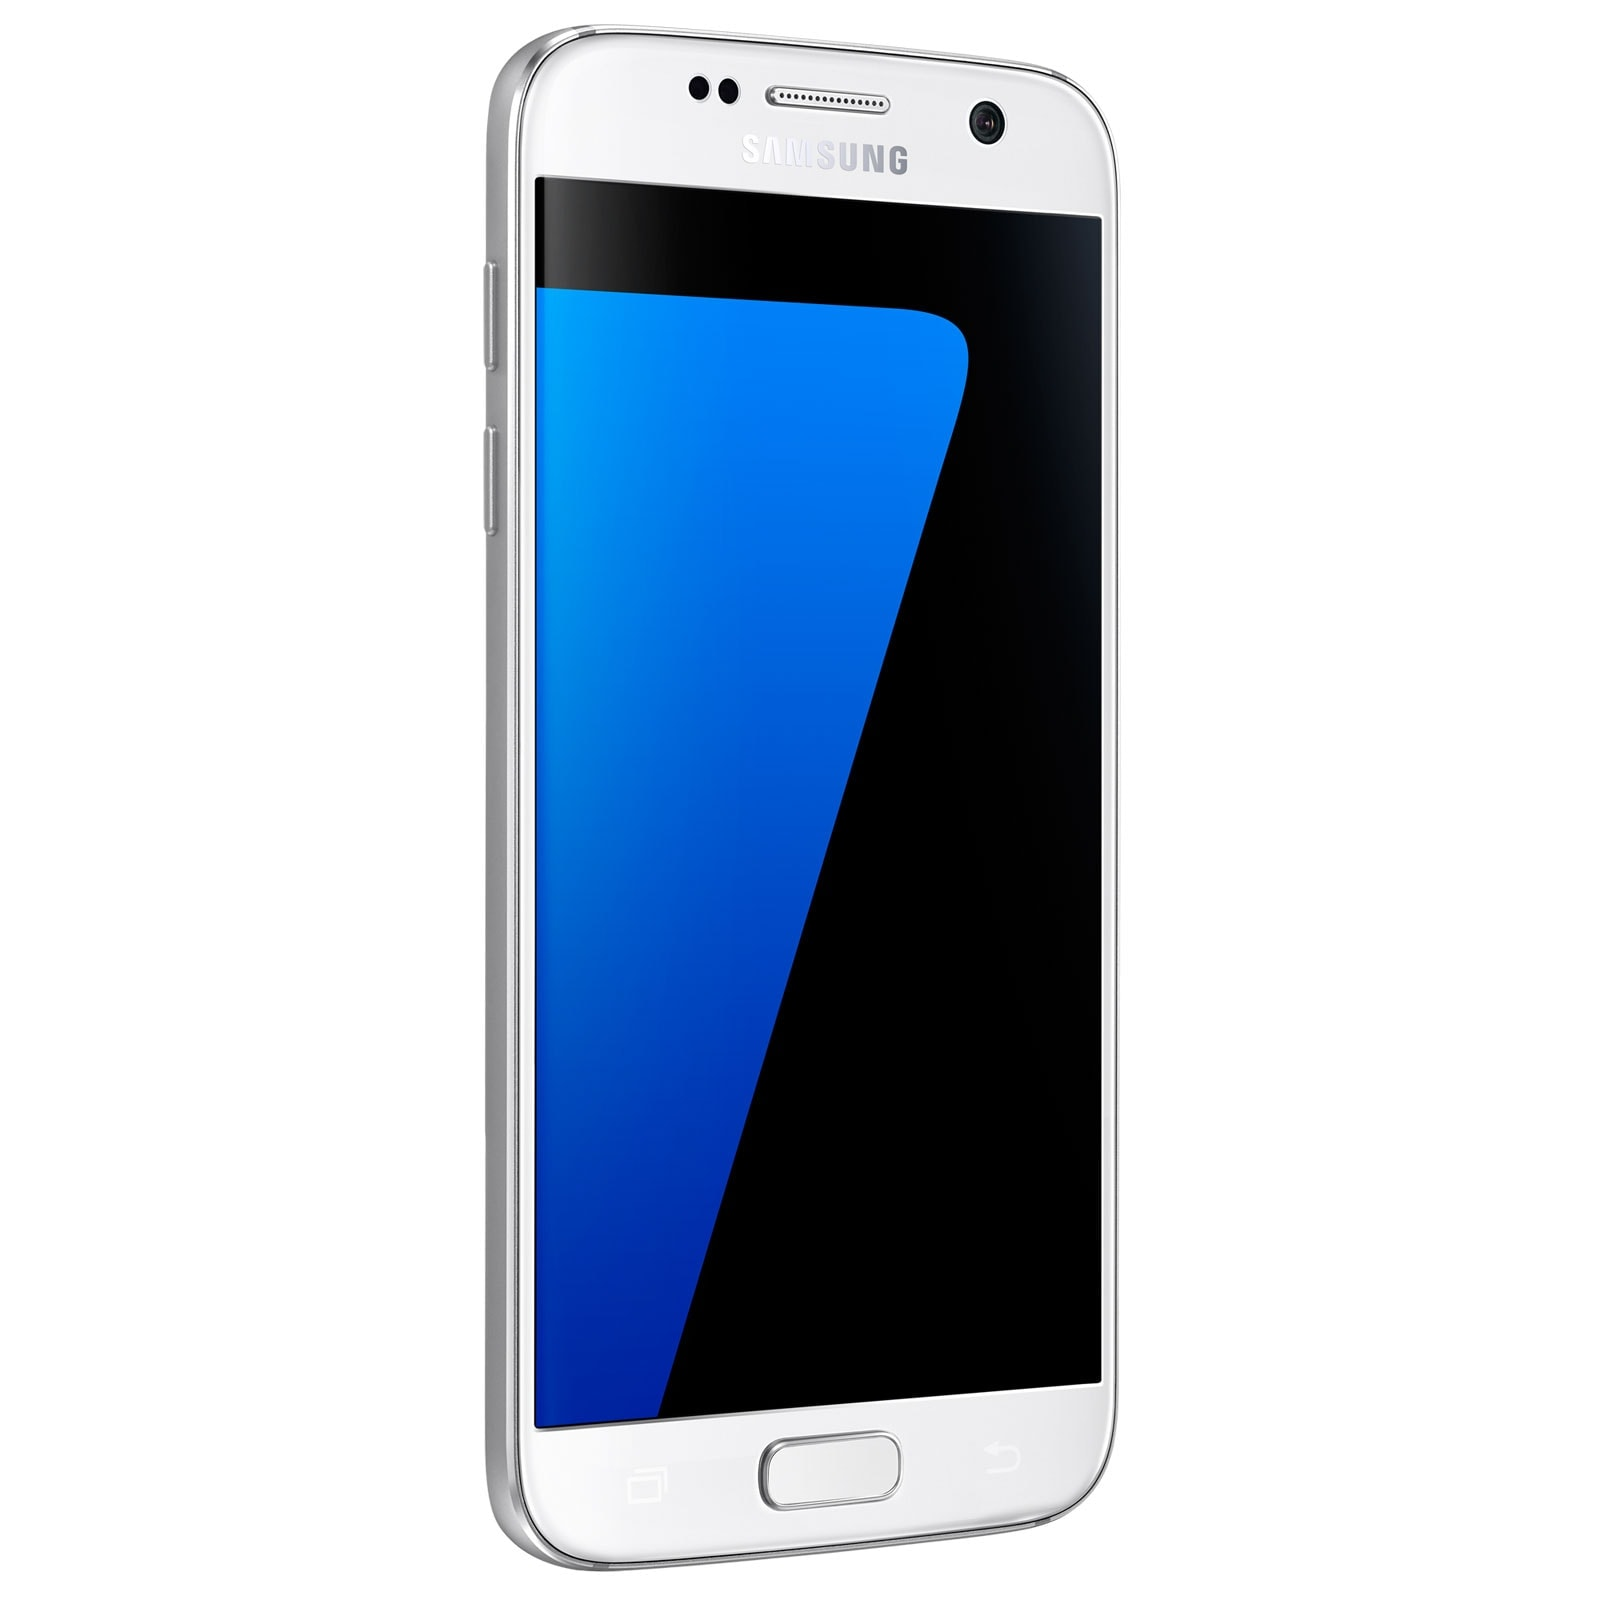 Samsung Galaxy S7 32Go G930F White - Téléphonie Samsung - 0